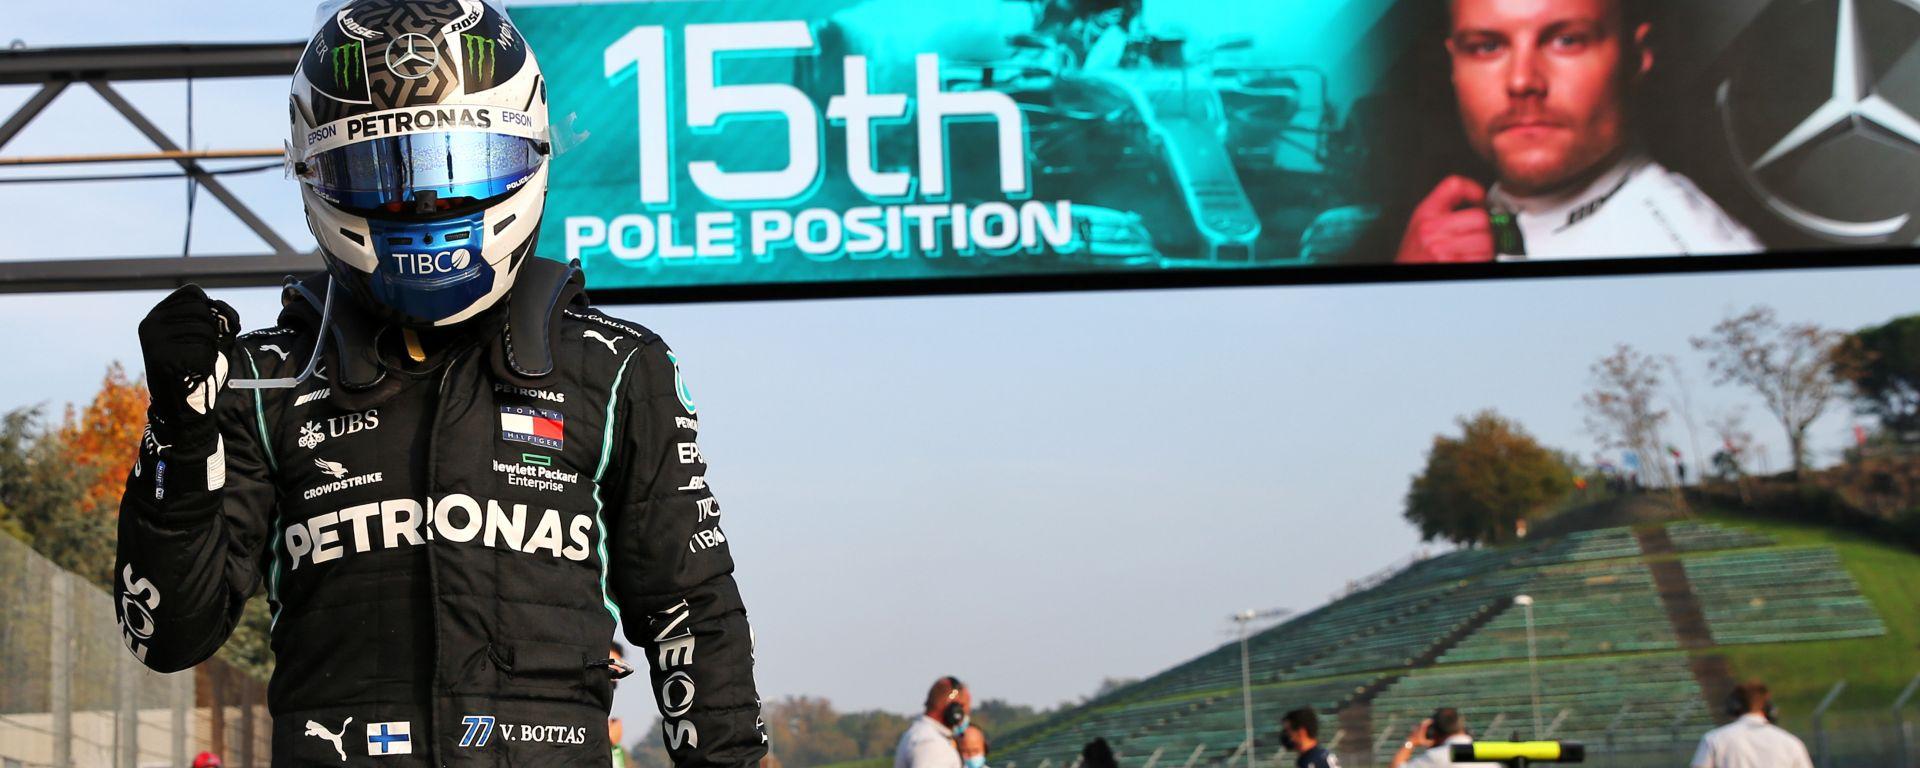 F1 GP Emilia Romagna 2020, Imola: Valtteri Bottas (Mercedes AMG F1) esulta dopo la pole